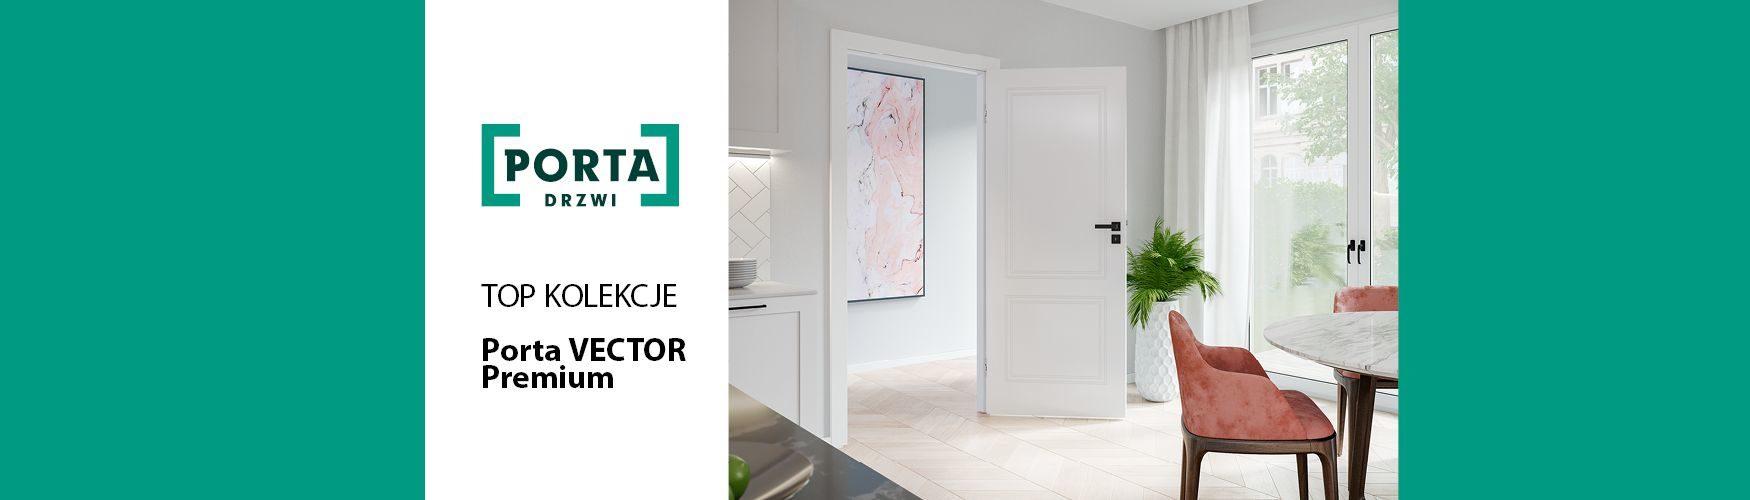 Porta Vector Premium Top Kolekcje Slide